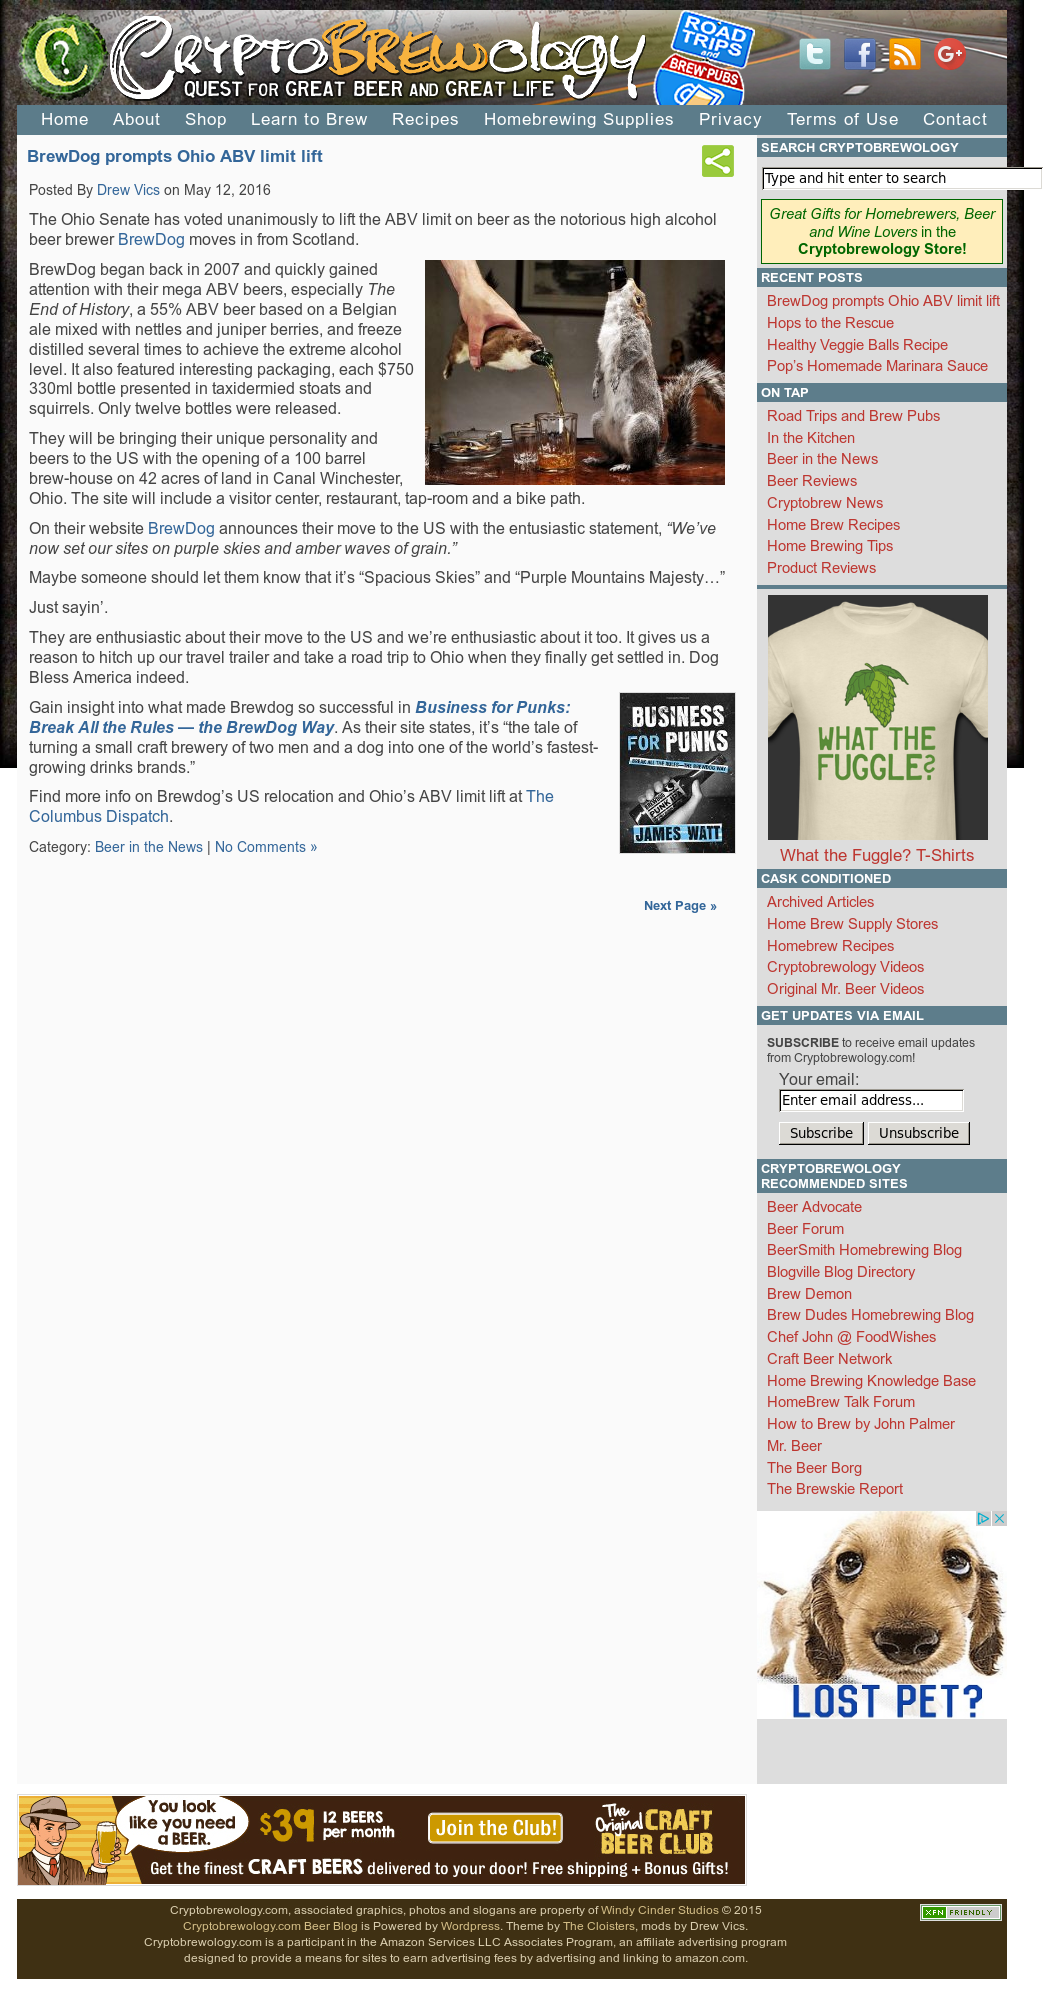 Cryptobrewology com, Associated Graphics, Photos And Slogans Are